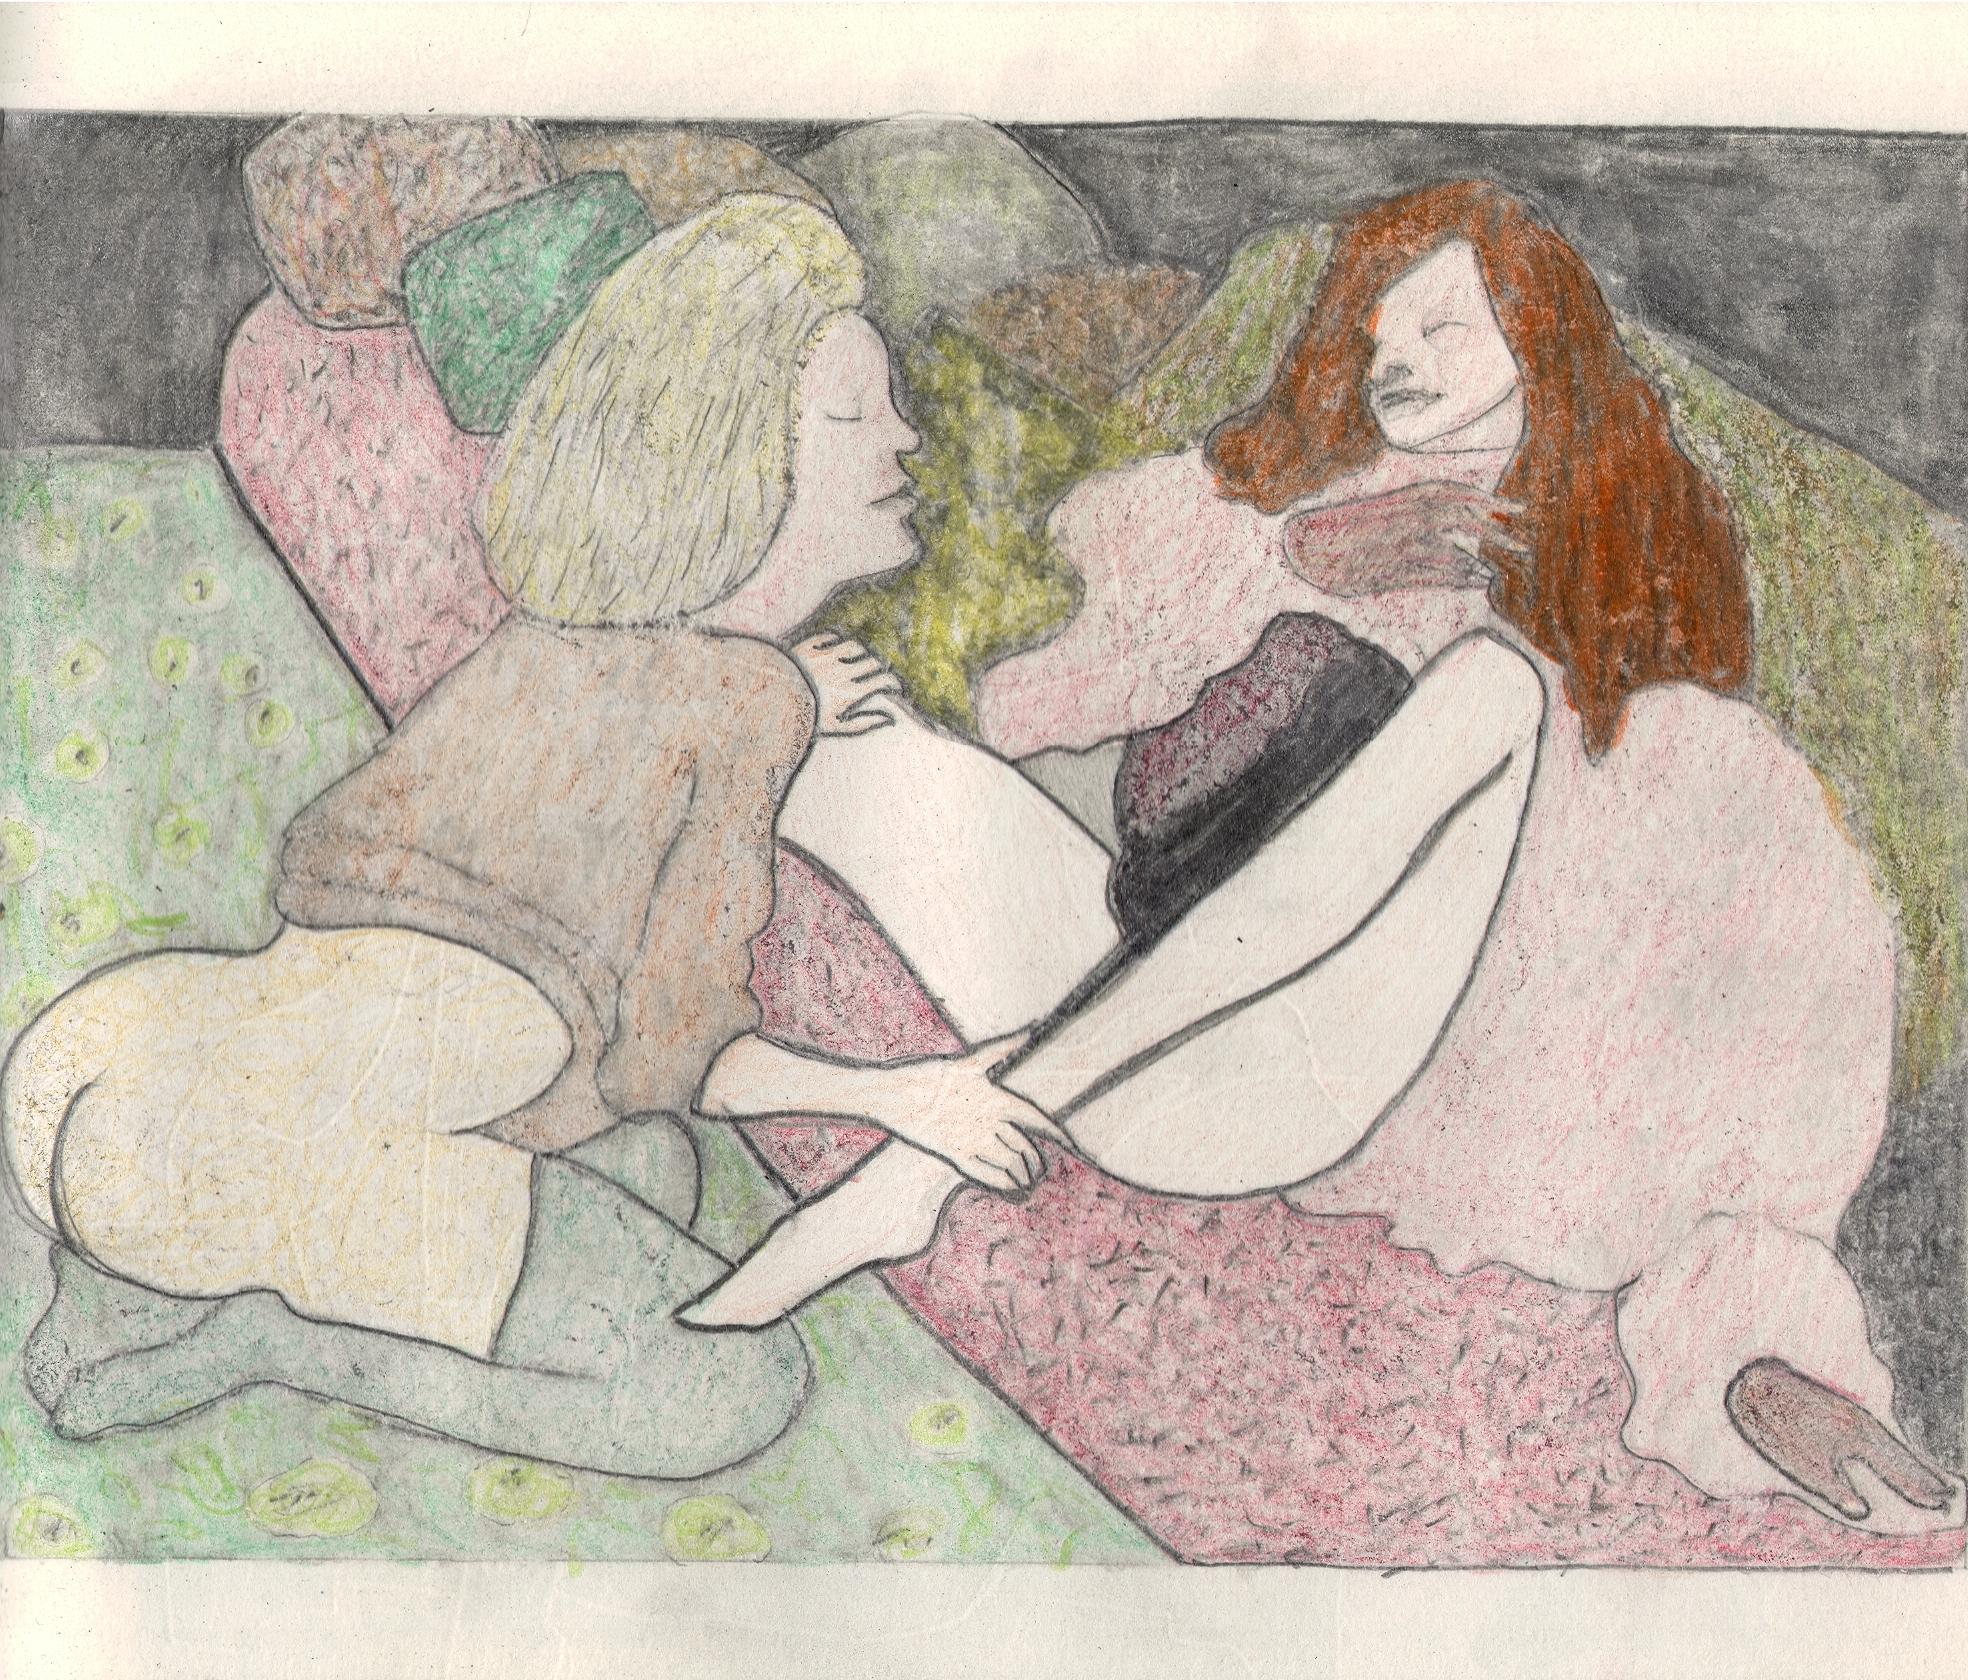 O.T. ( Serie Leonor Fini 3 ), 2018  Bleistift auf Papier, 26x35.5cm